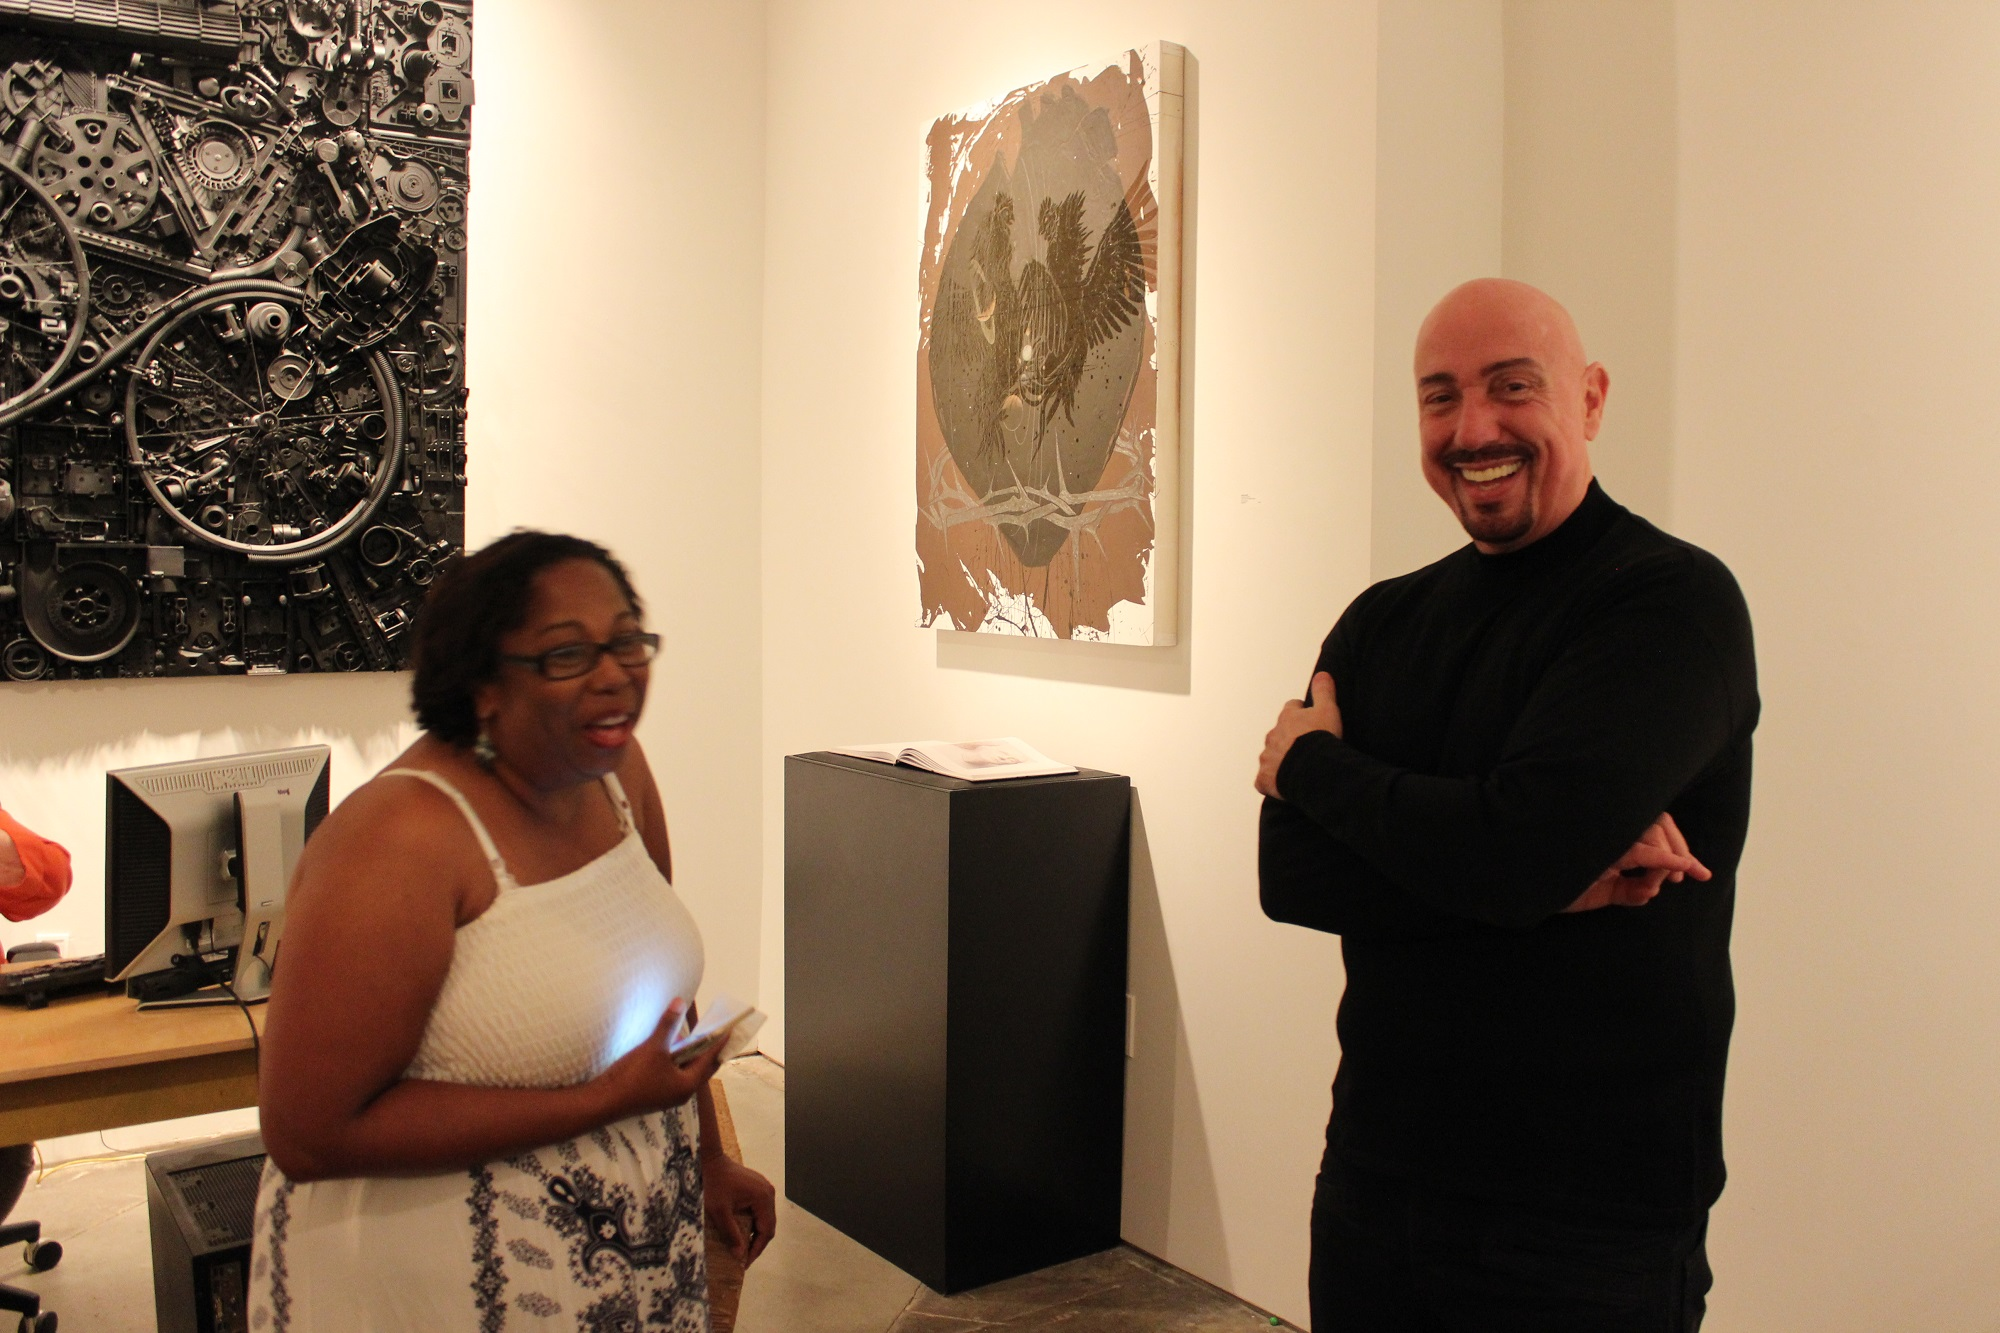 Frank Schroeder Bill Lowe Gallery Opening 19.JPG